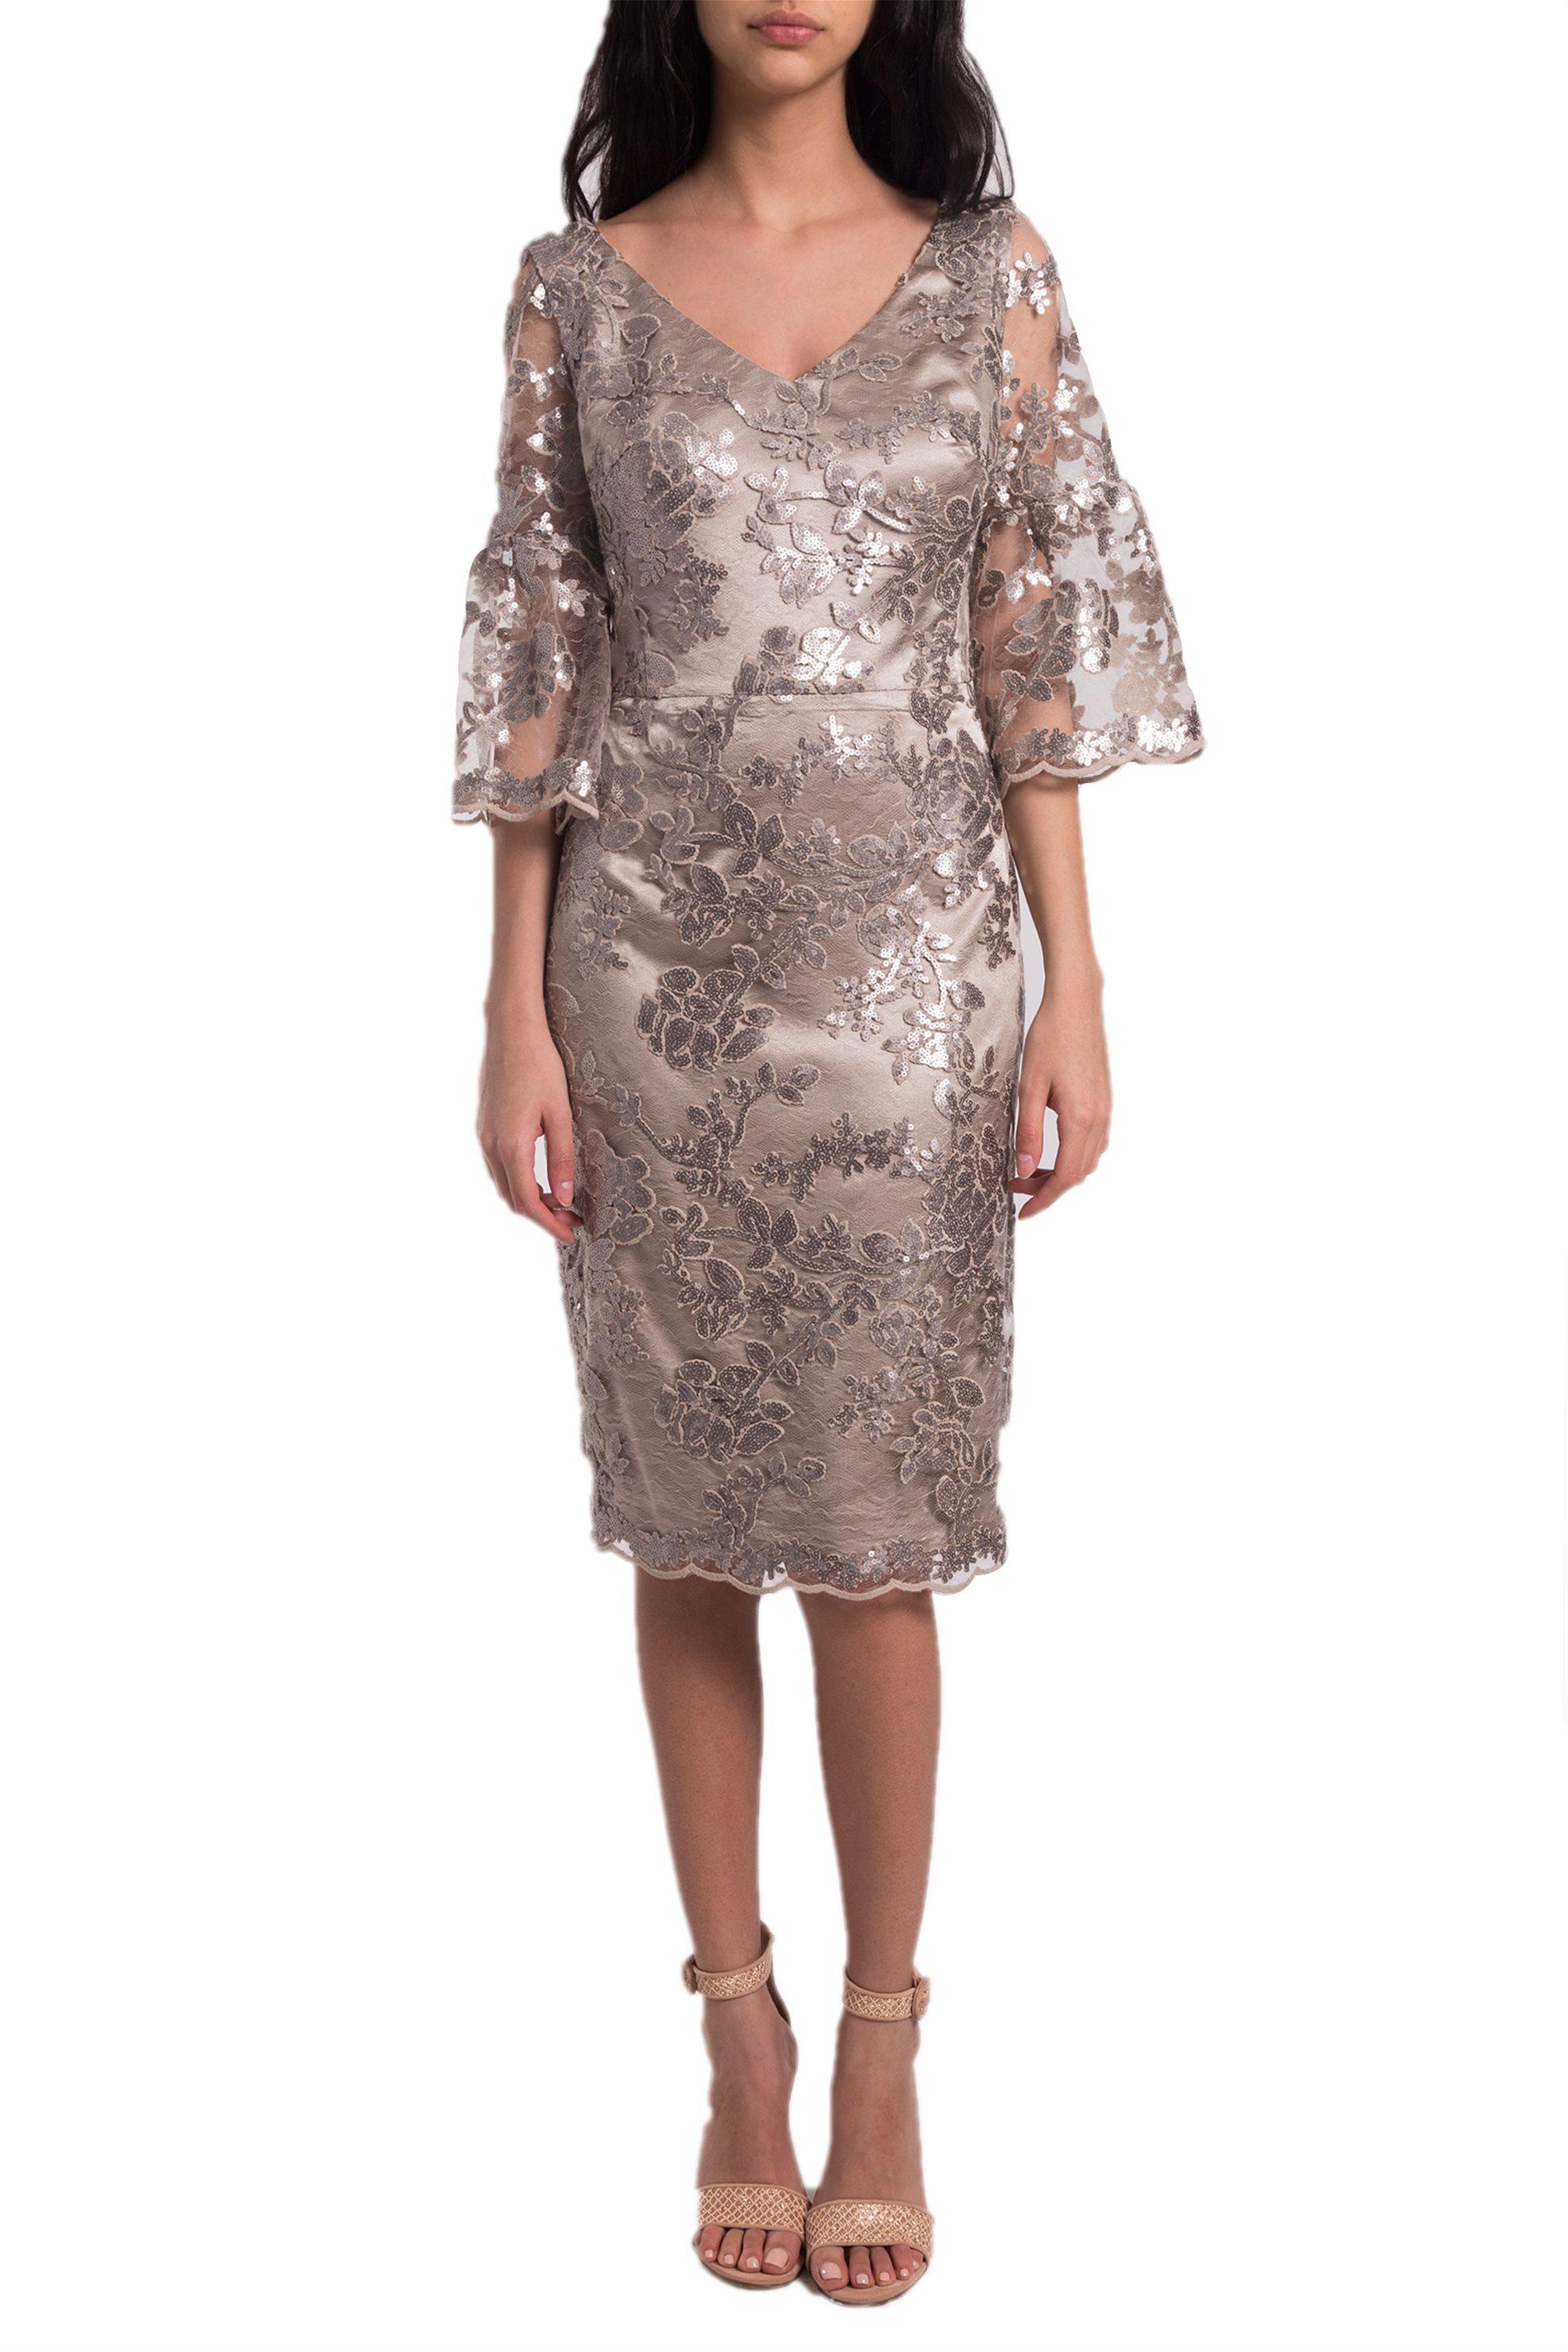 334f7107a412 Γυναικεία   Ρούχα   Φορέματα   Καθημερινά   30841 SD Βραδινό μάξι ...